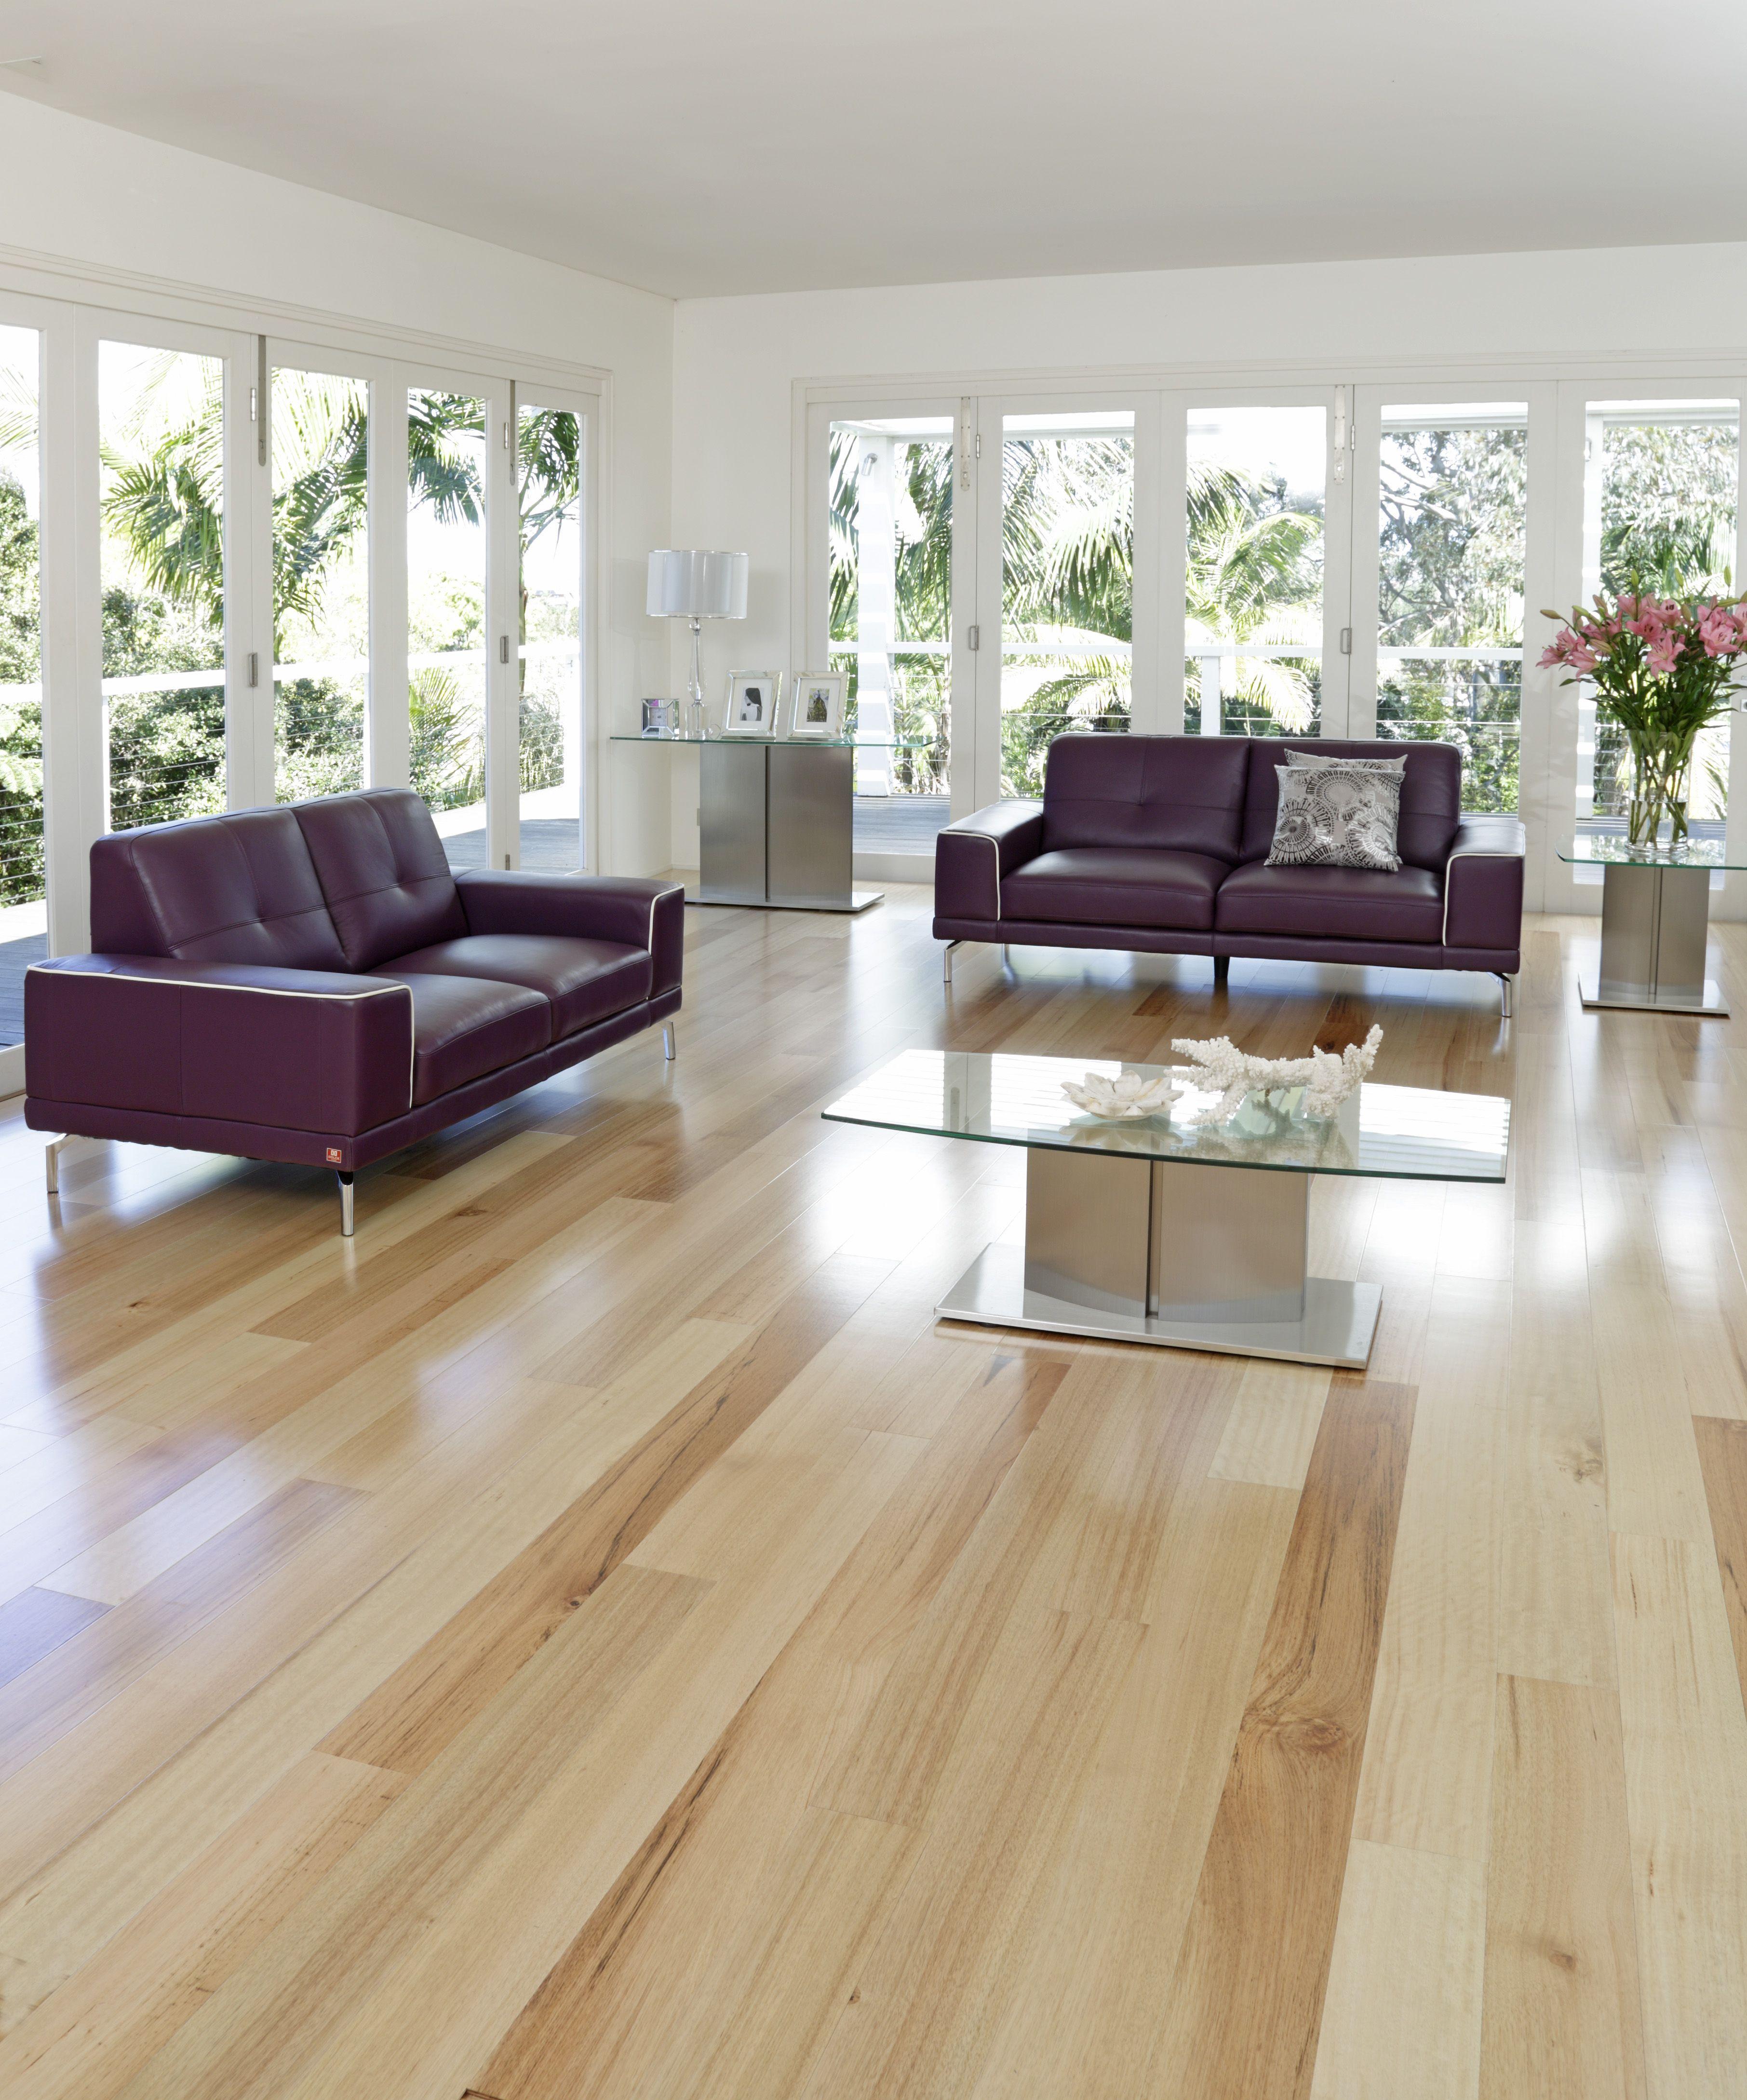 Timbermax hardwood flooring Tasmanian Oak. Love this